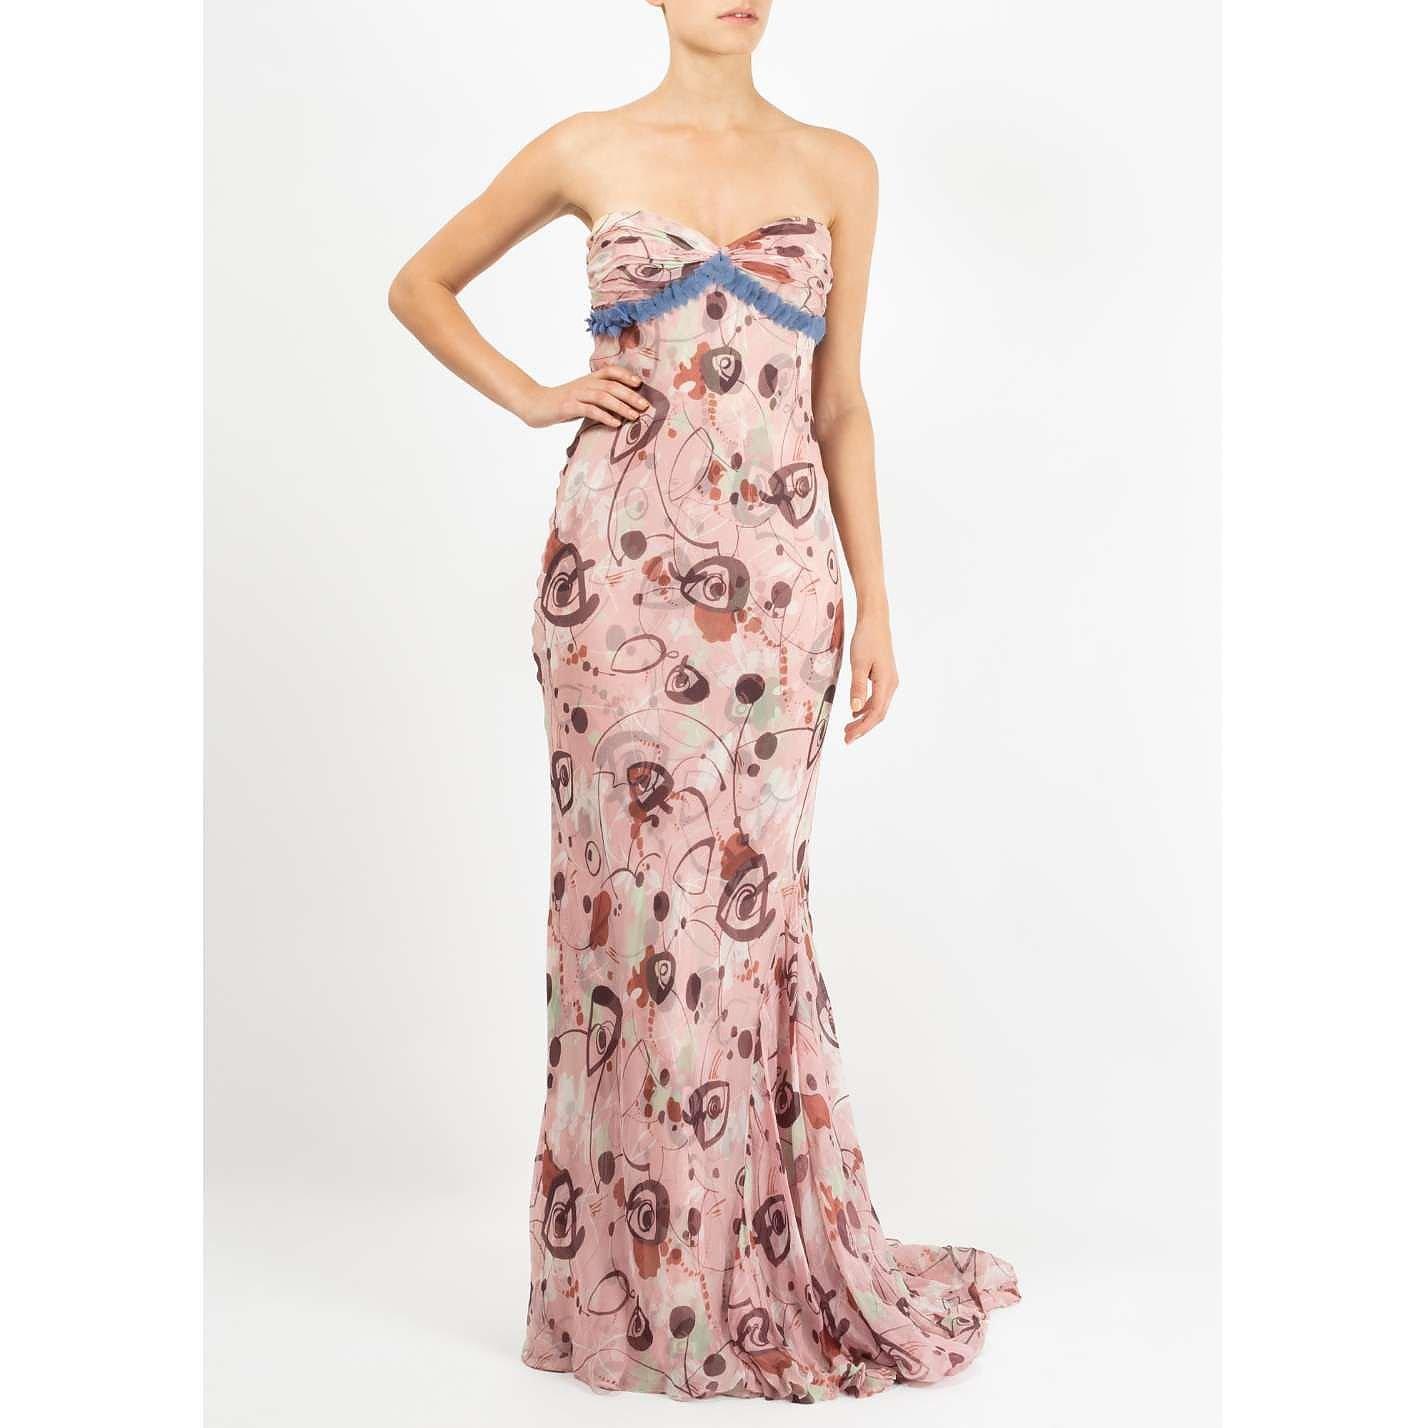 Vera Wang Patterned Strapless Dress